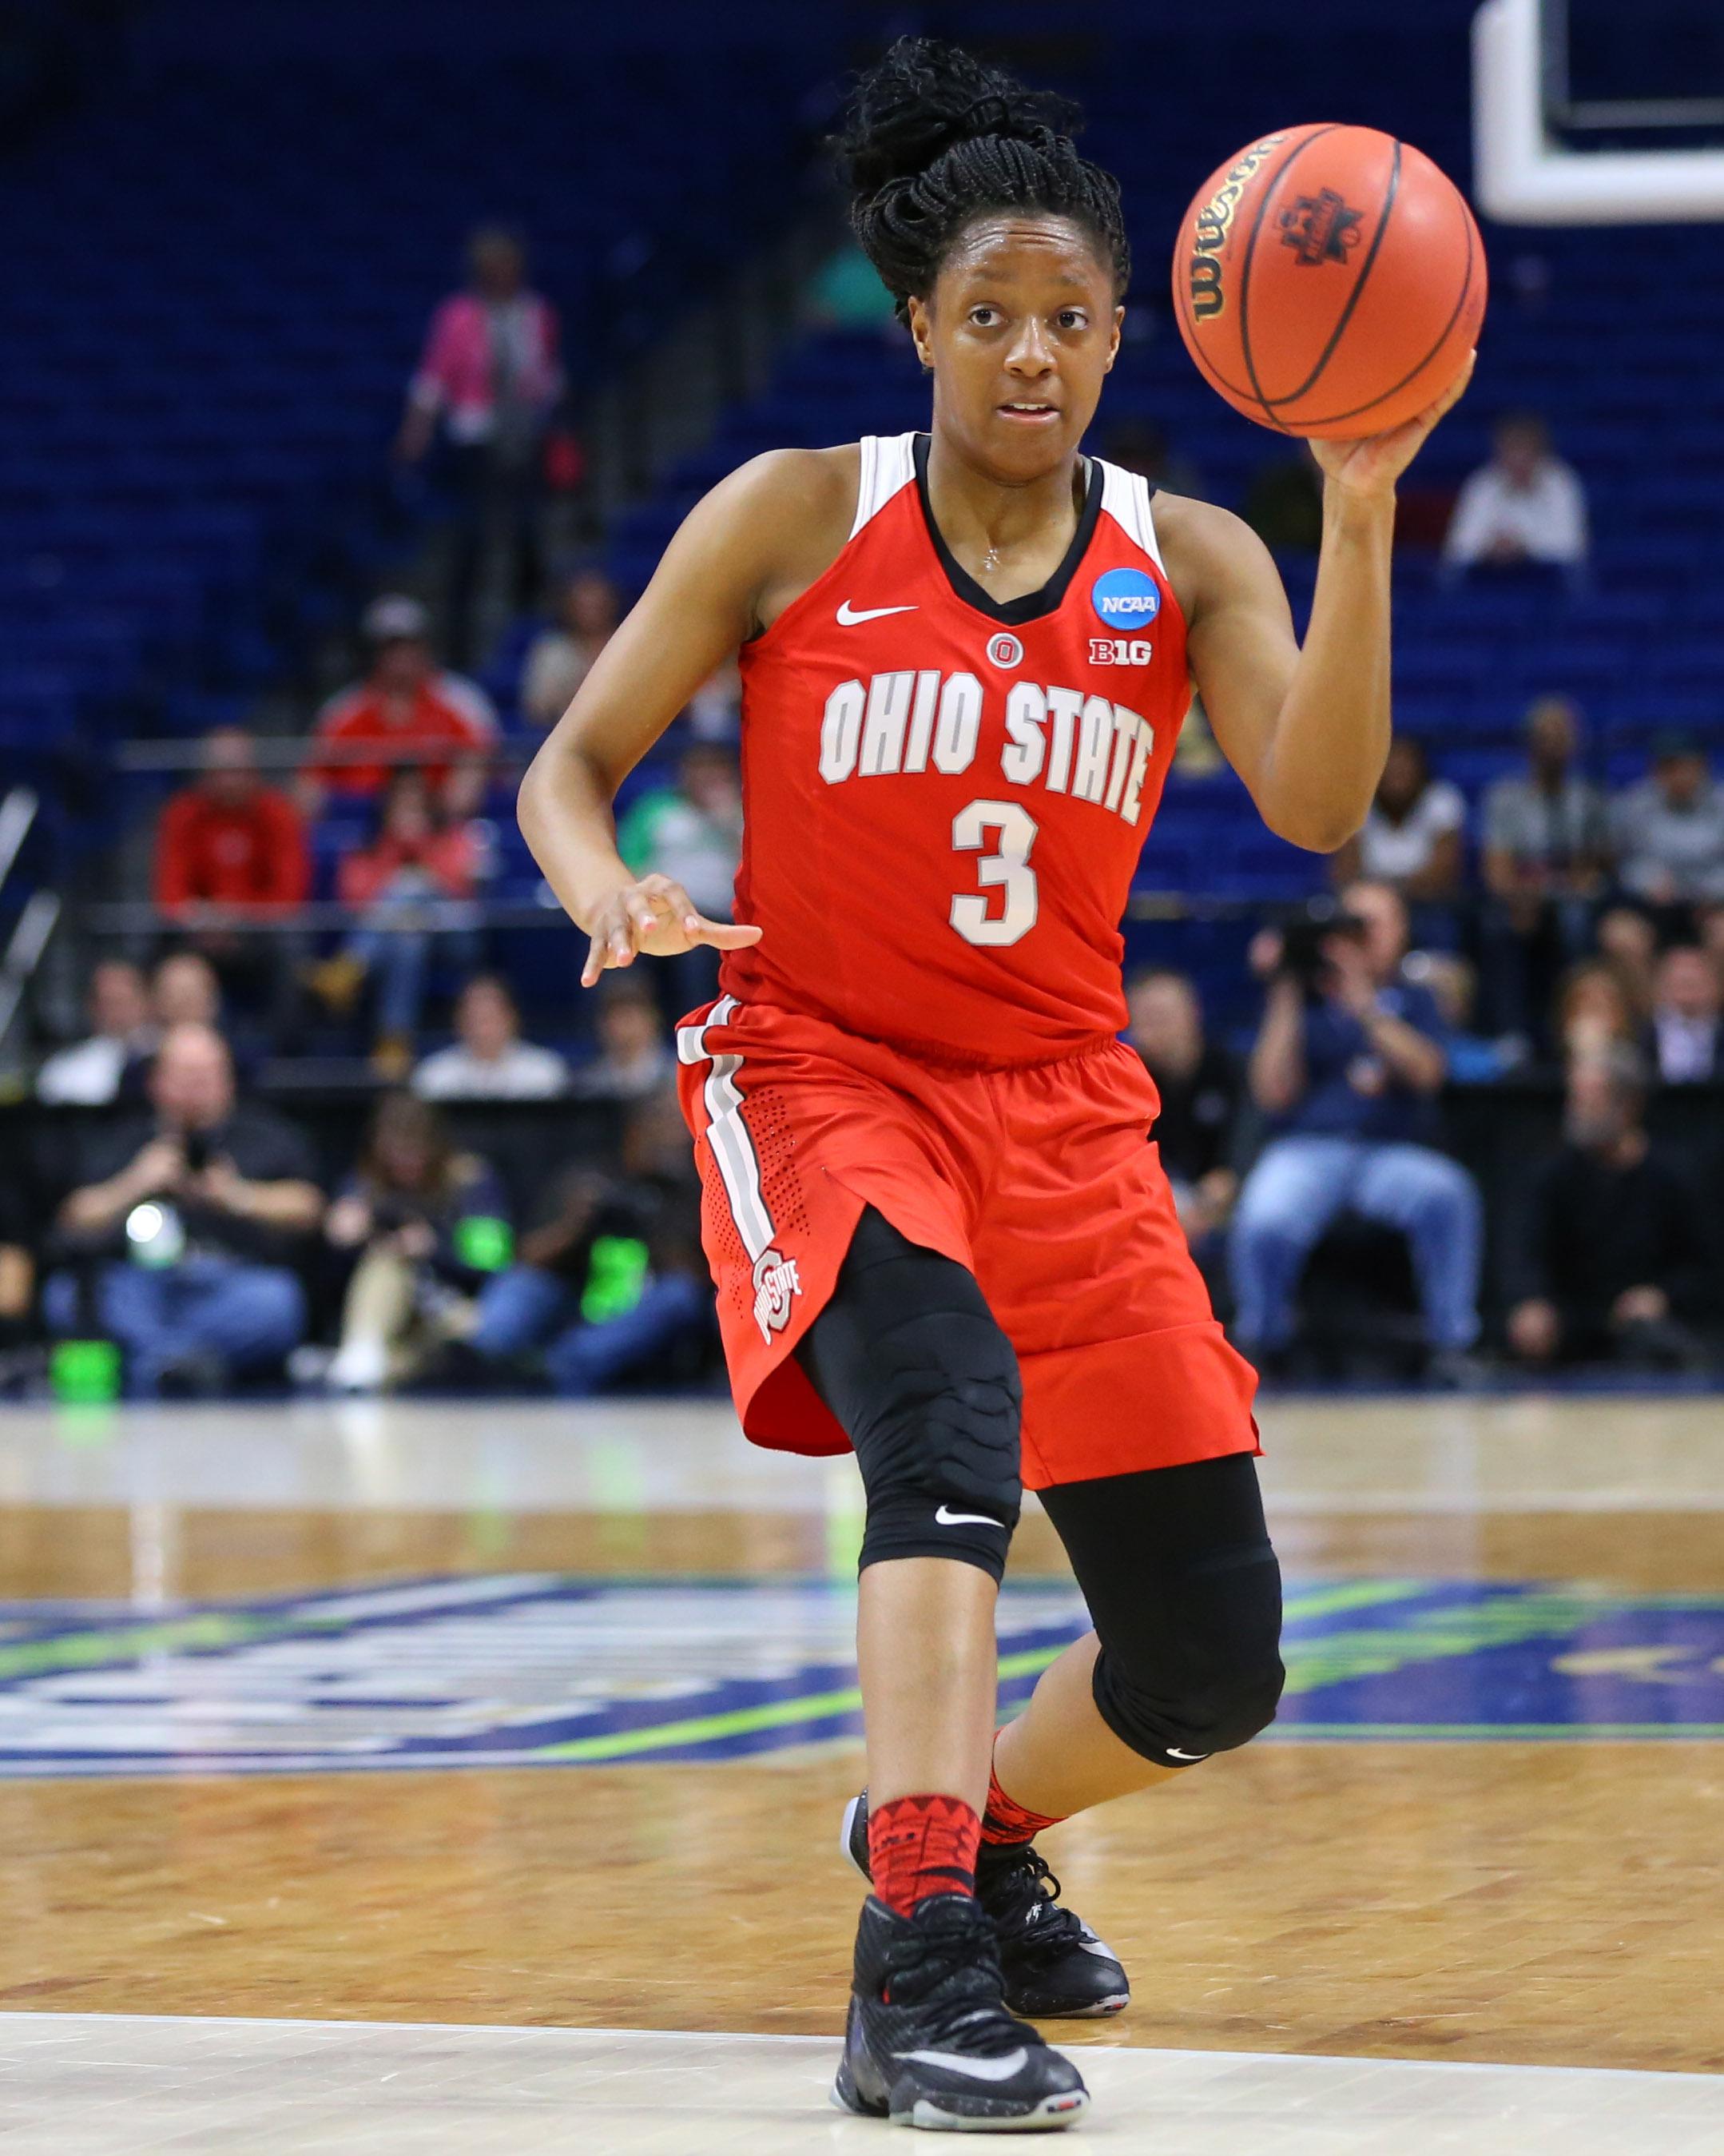 NCAA Womens Basketball: NCAA Tournament-Lexington Regional- Ohio State vs Notre Dame